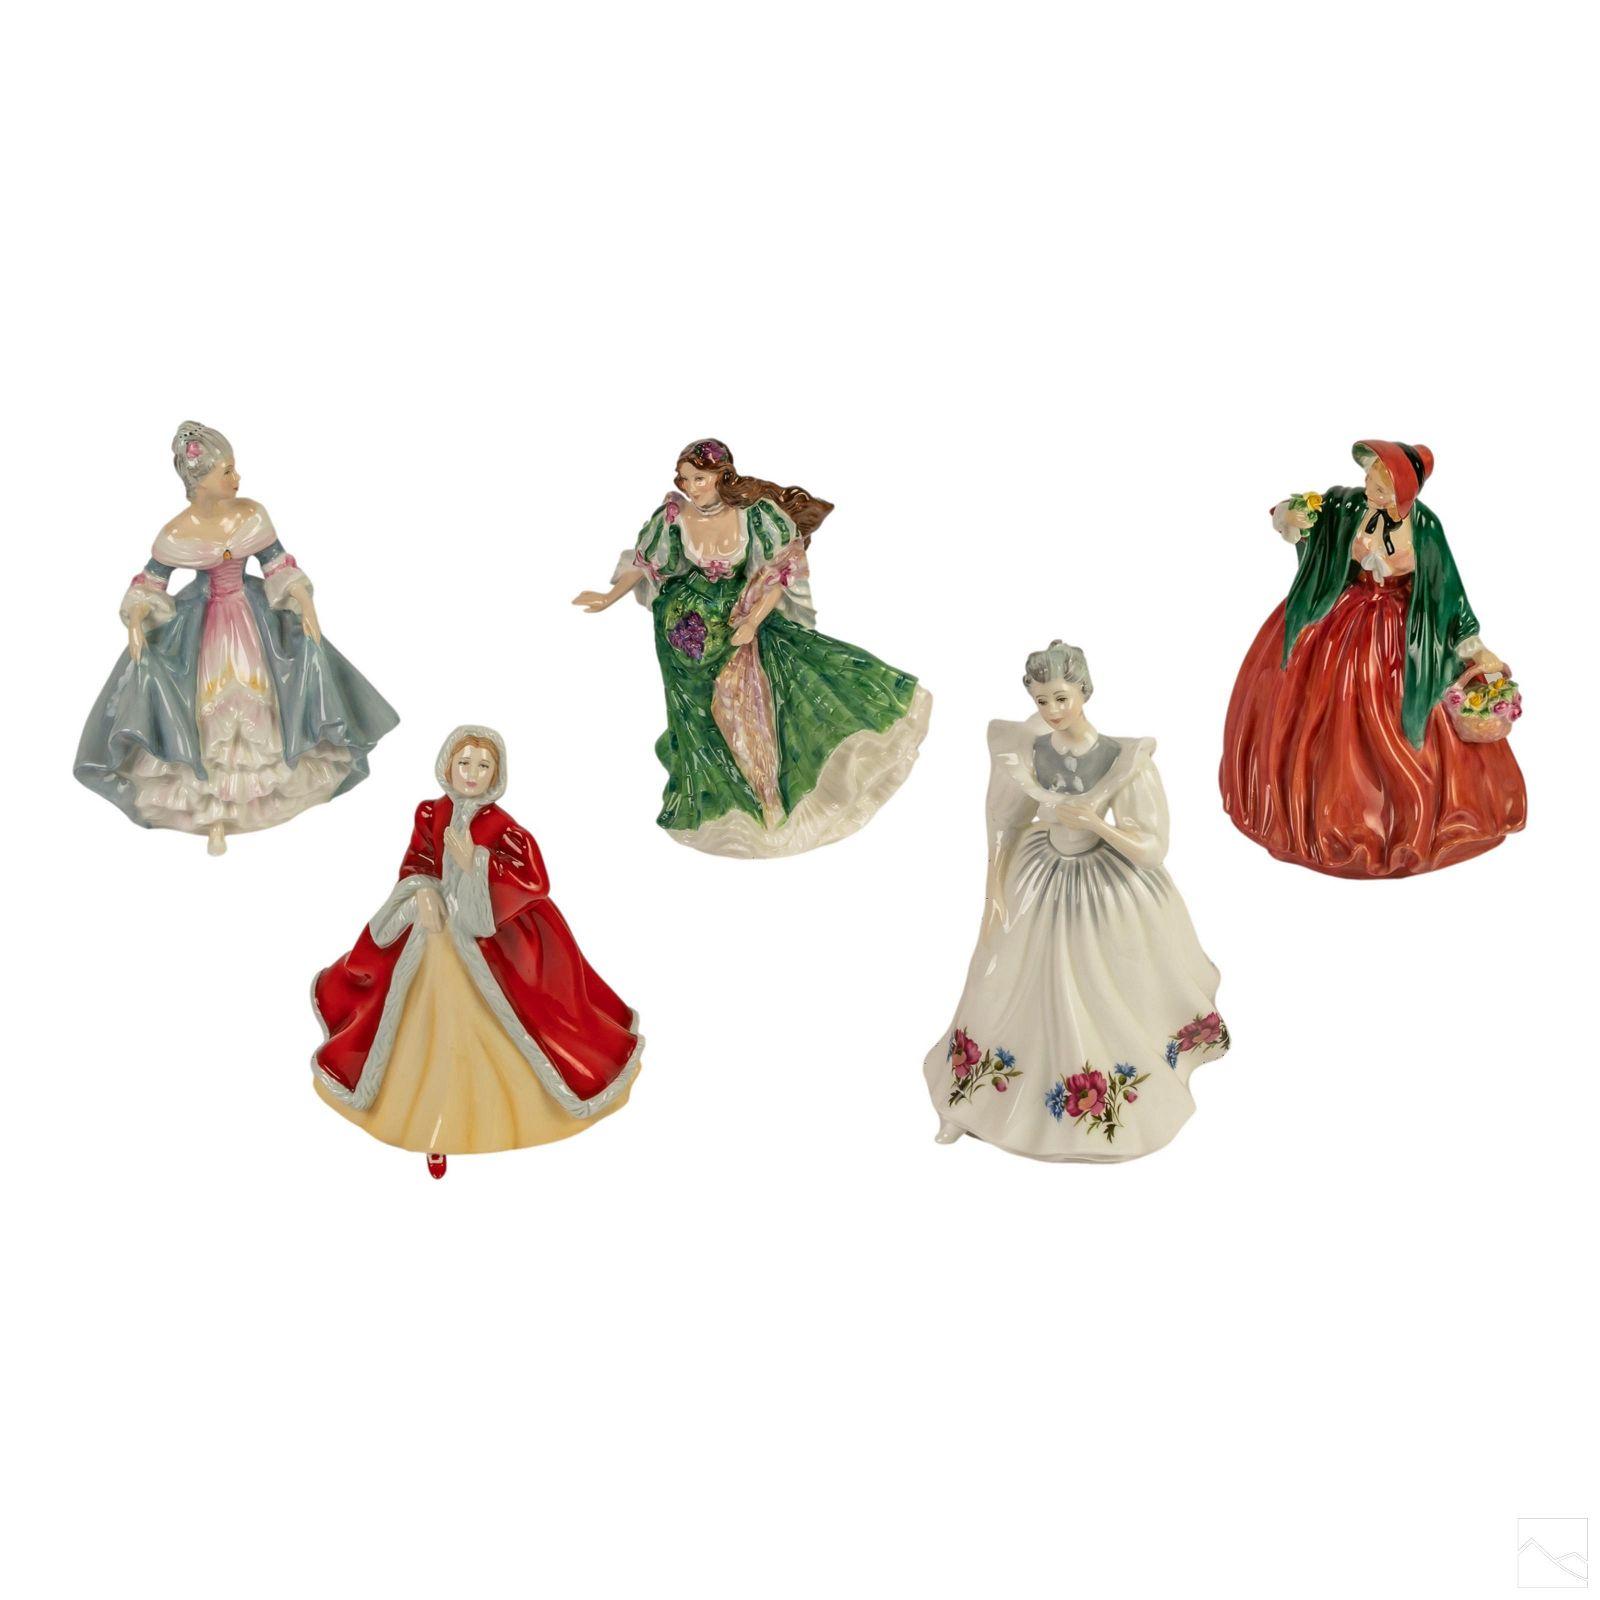 Royal Doulton Glazed English Ceramic Figurines LOT